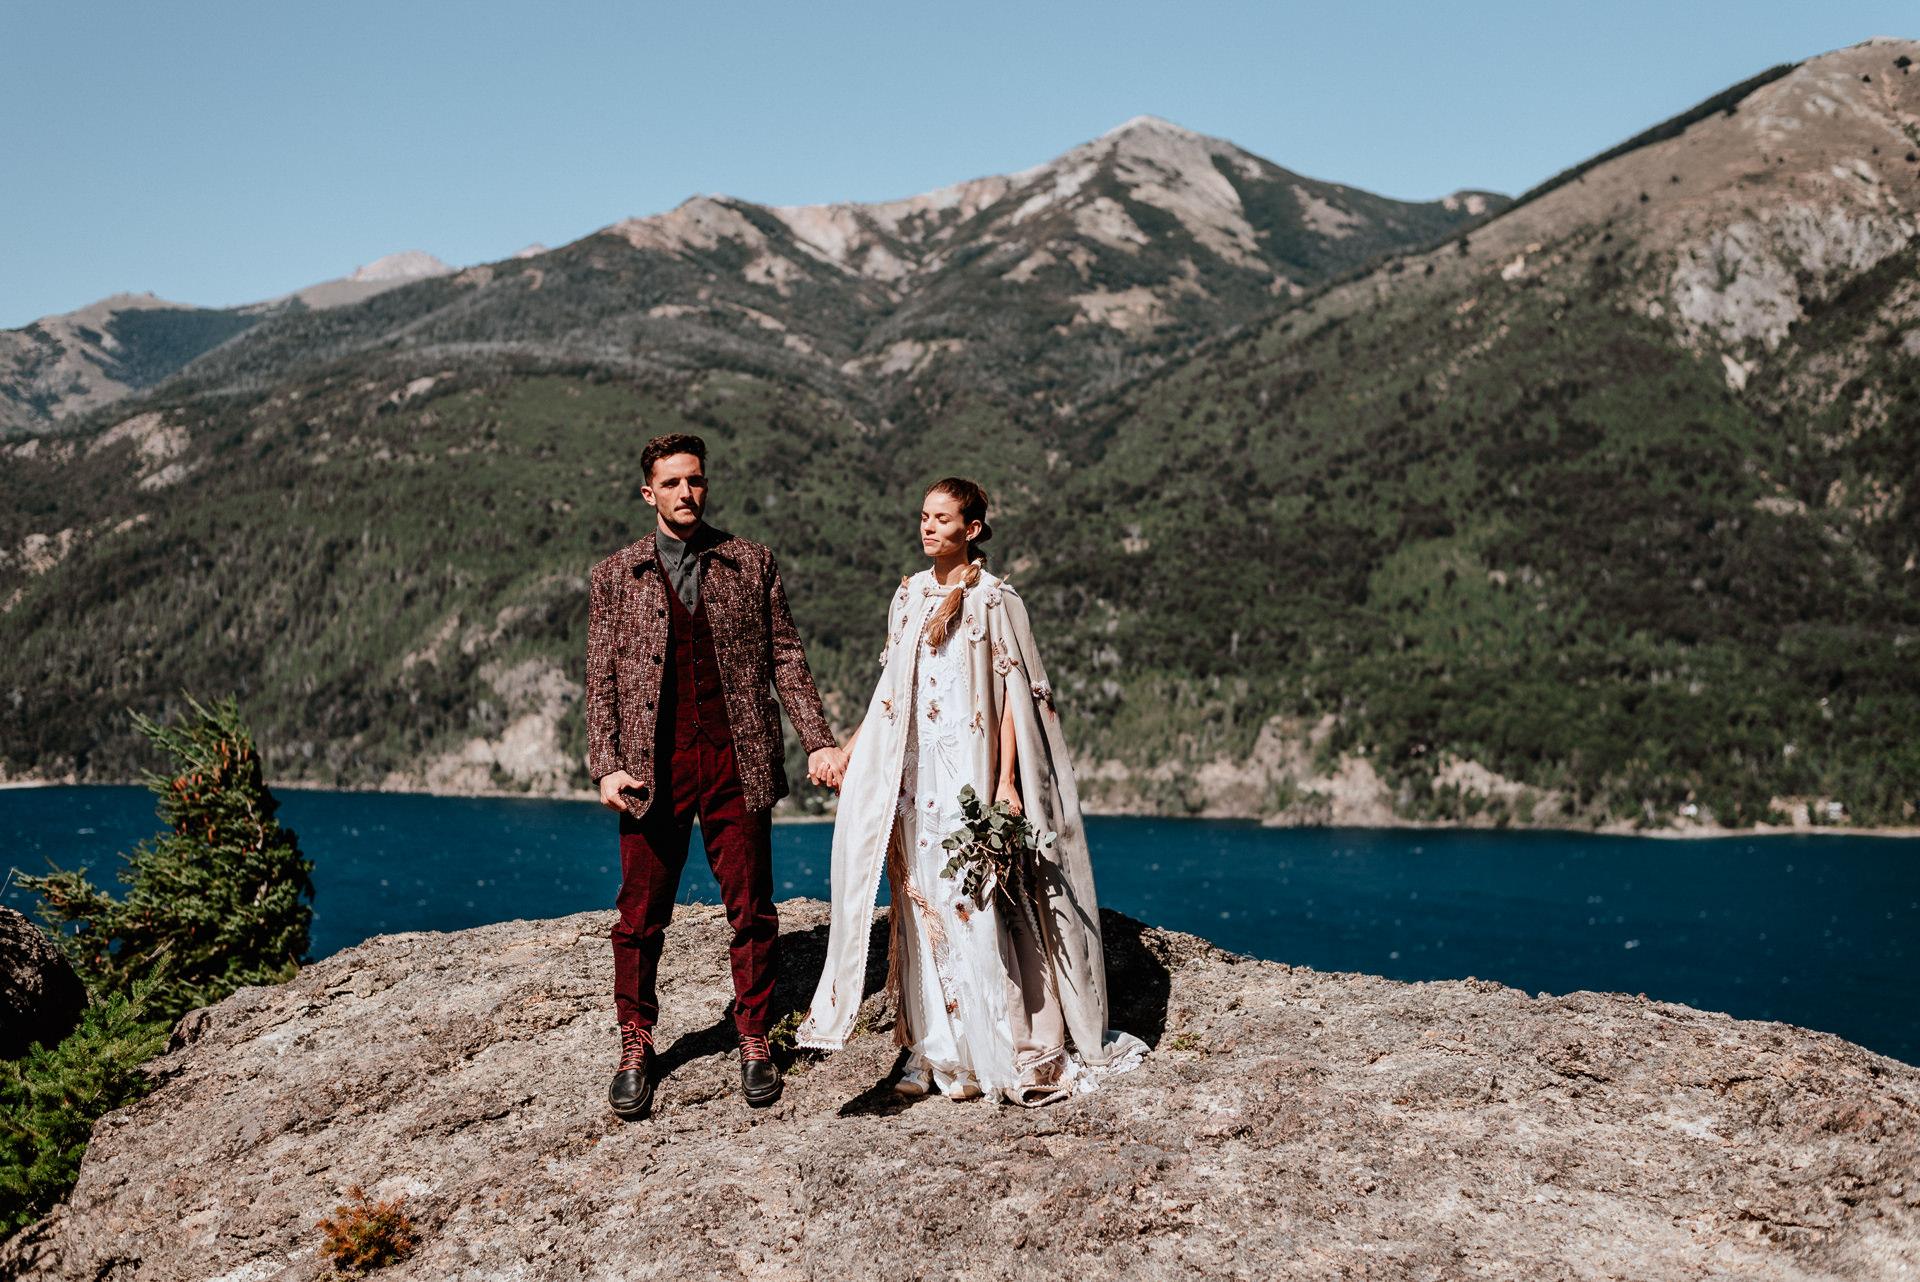 destination wedding in the mountains bariloche